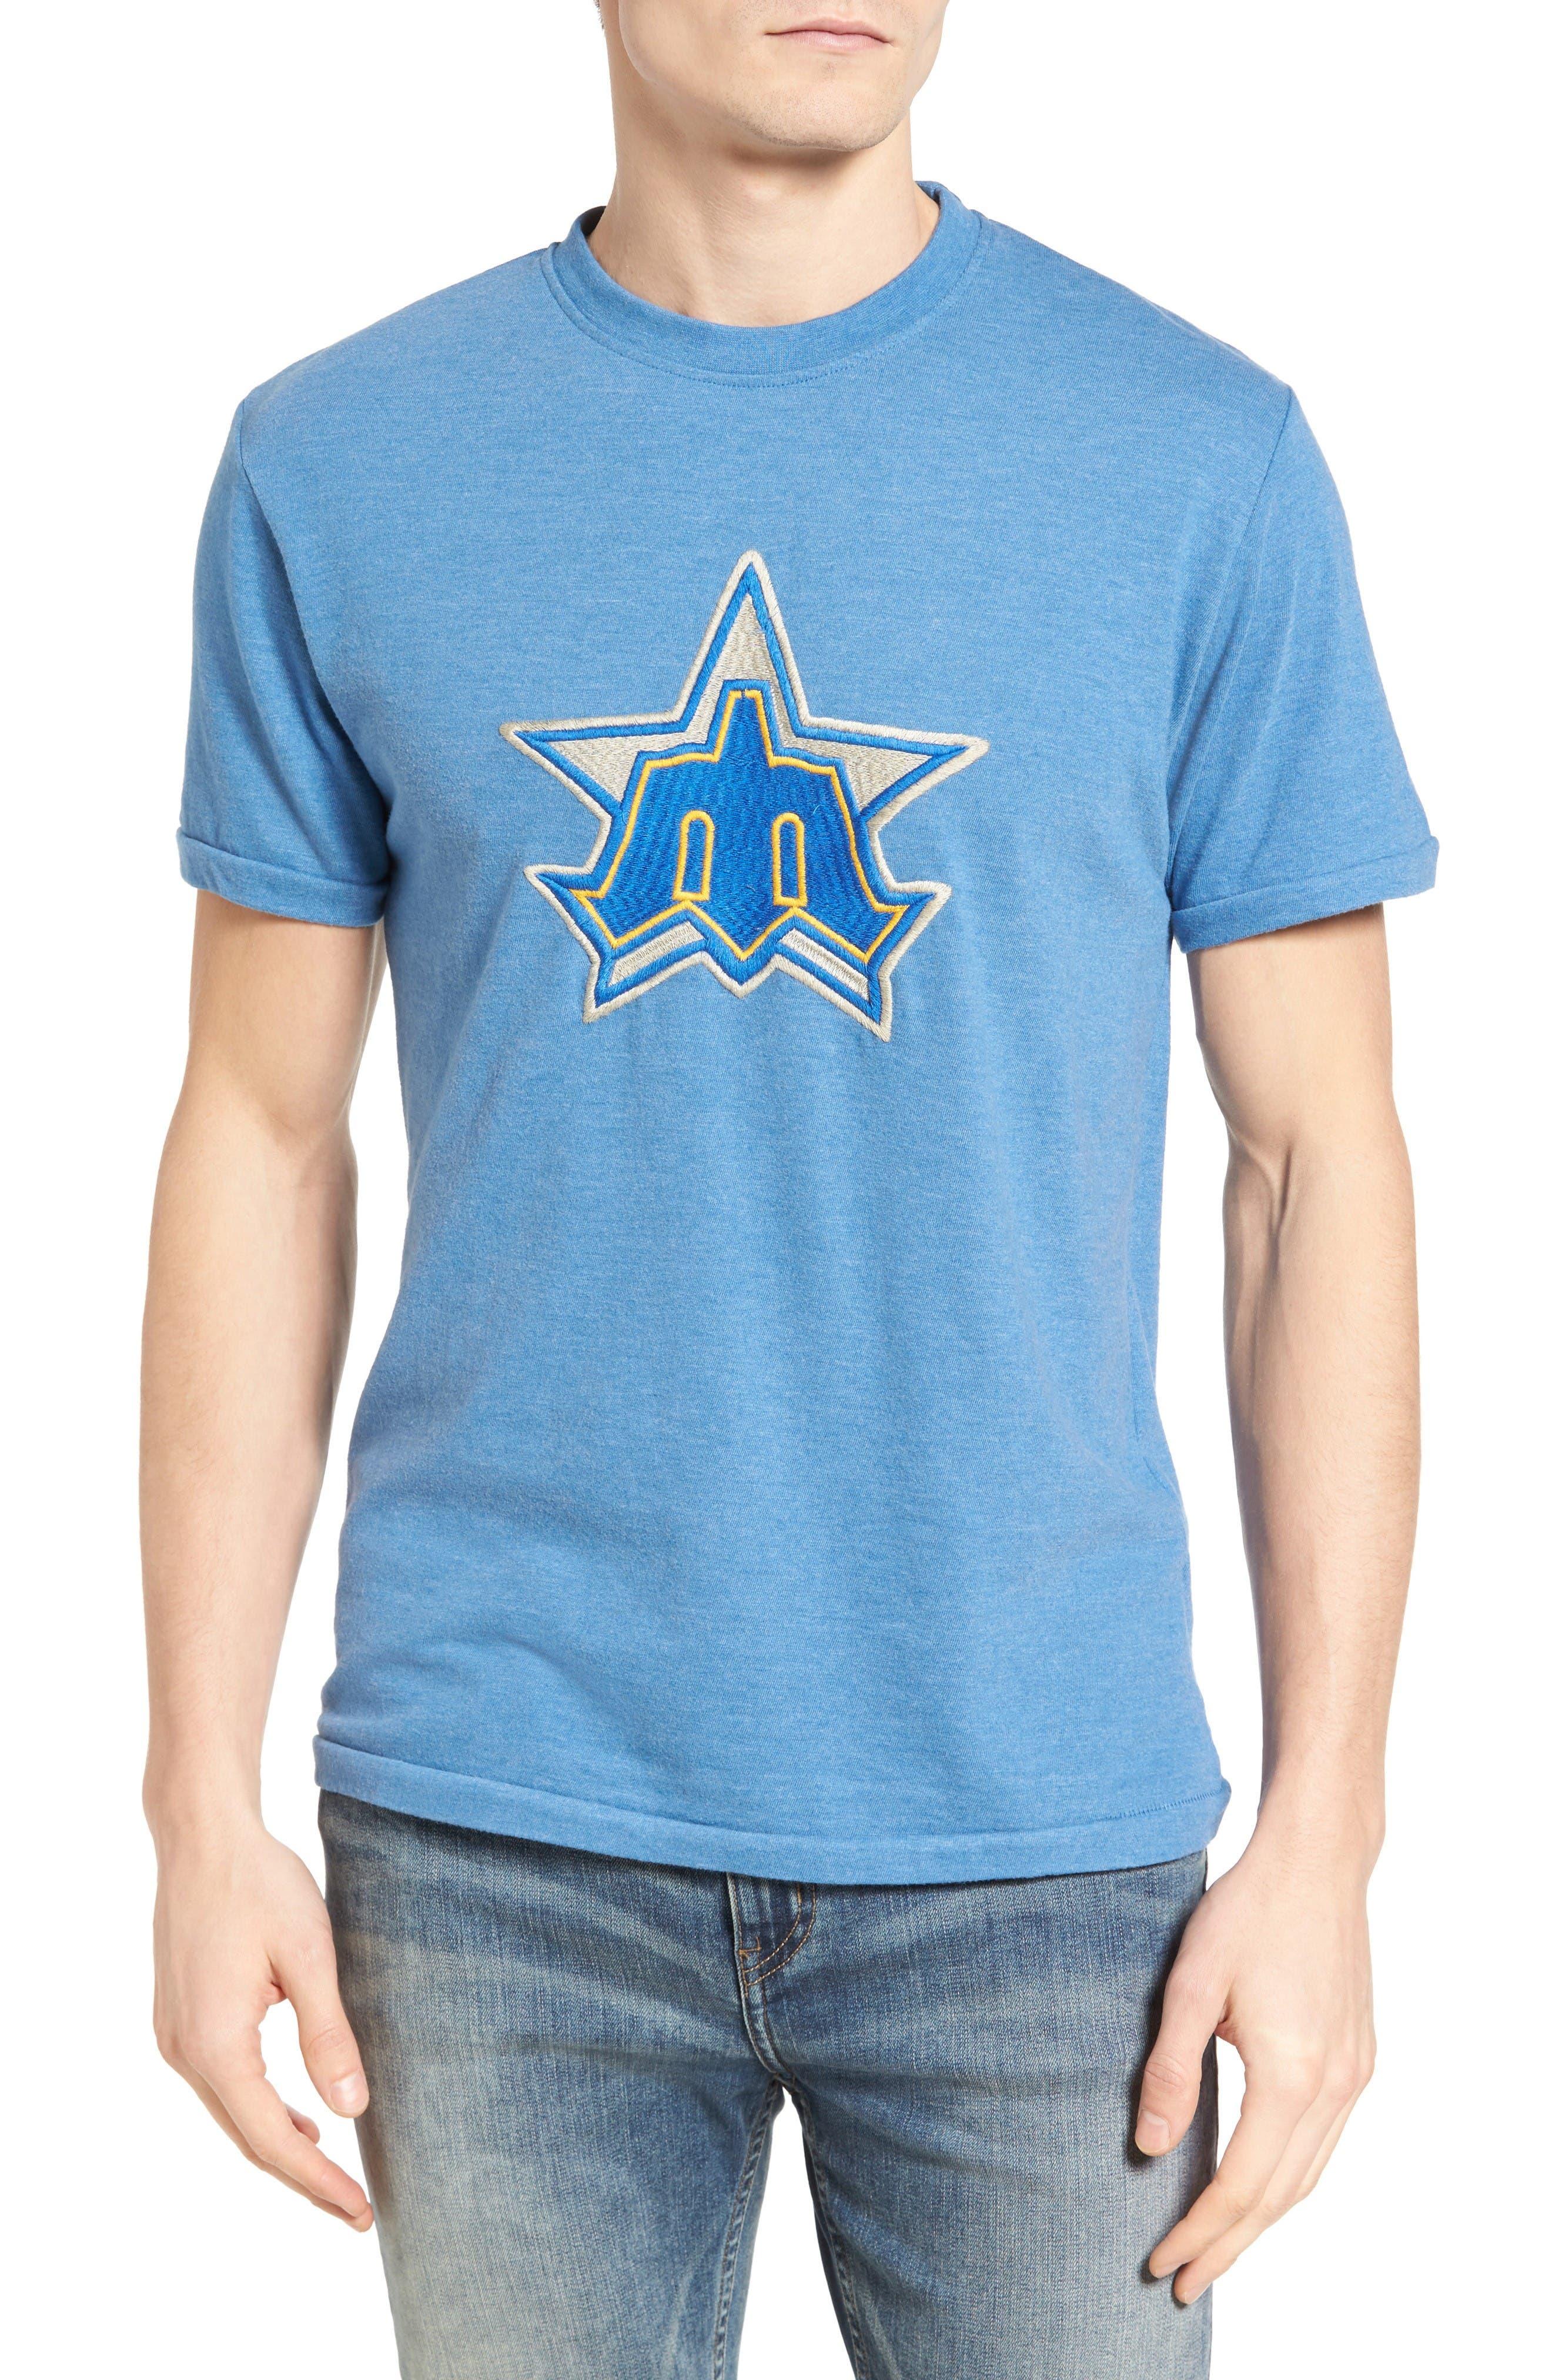 American Needle Hillwood Seattle Mariners T-Shirt